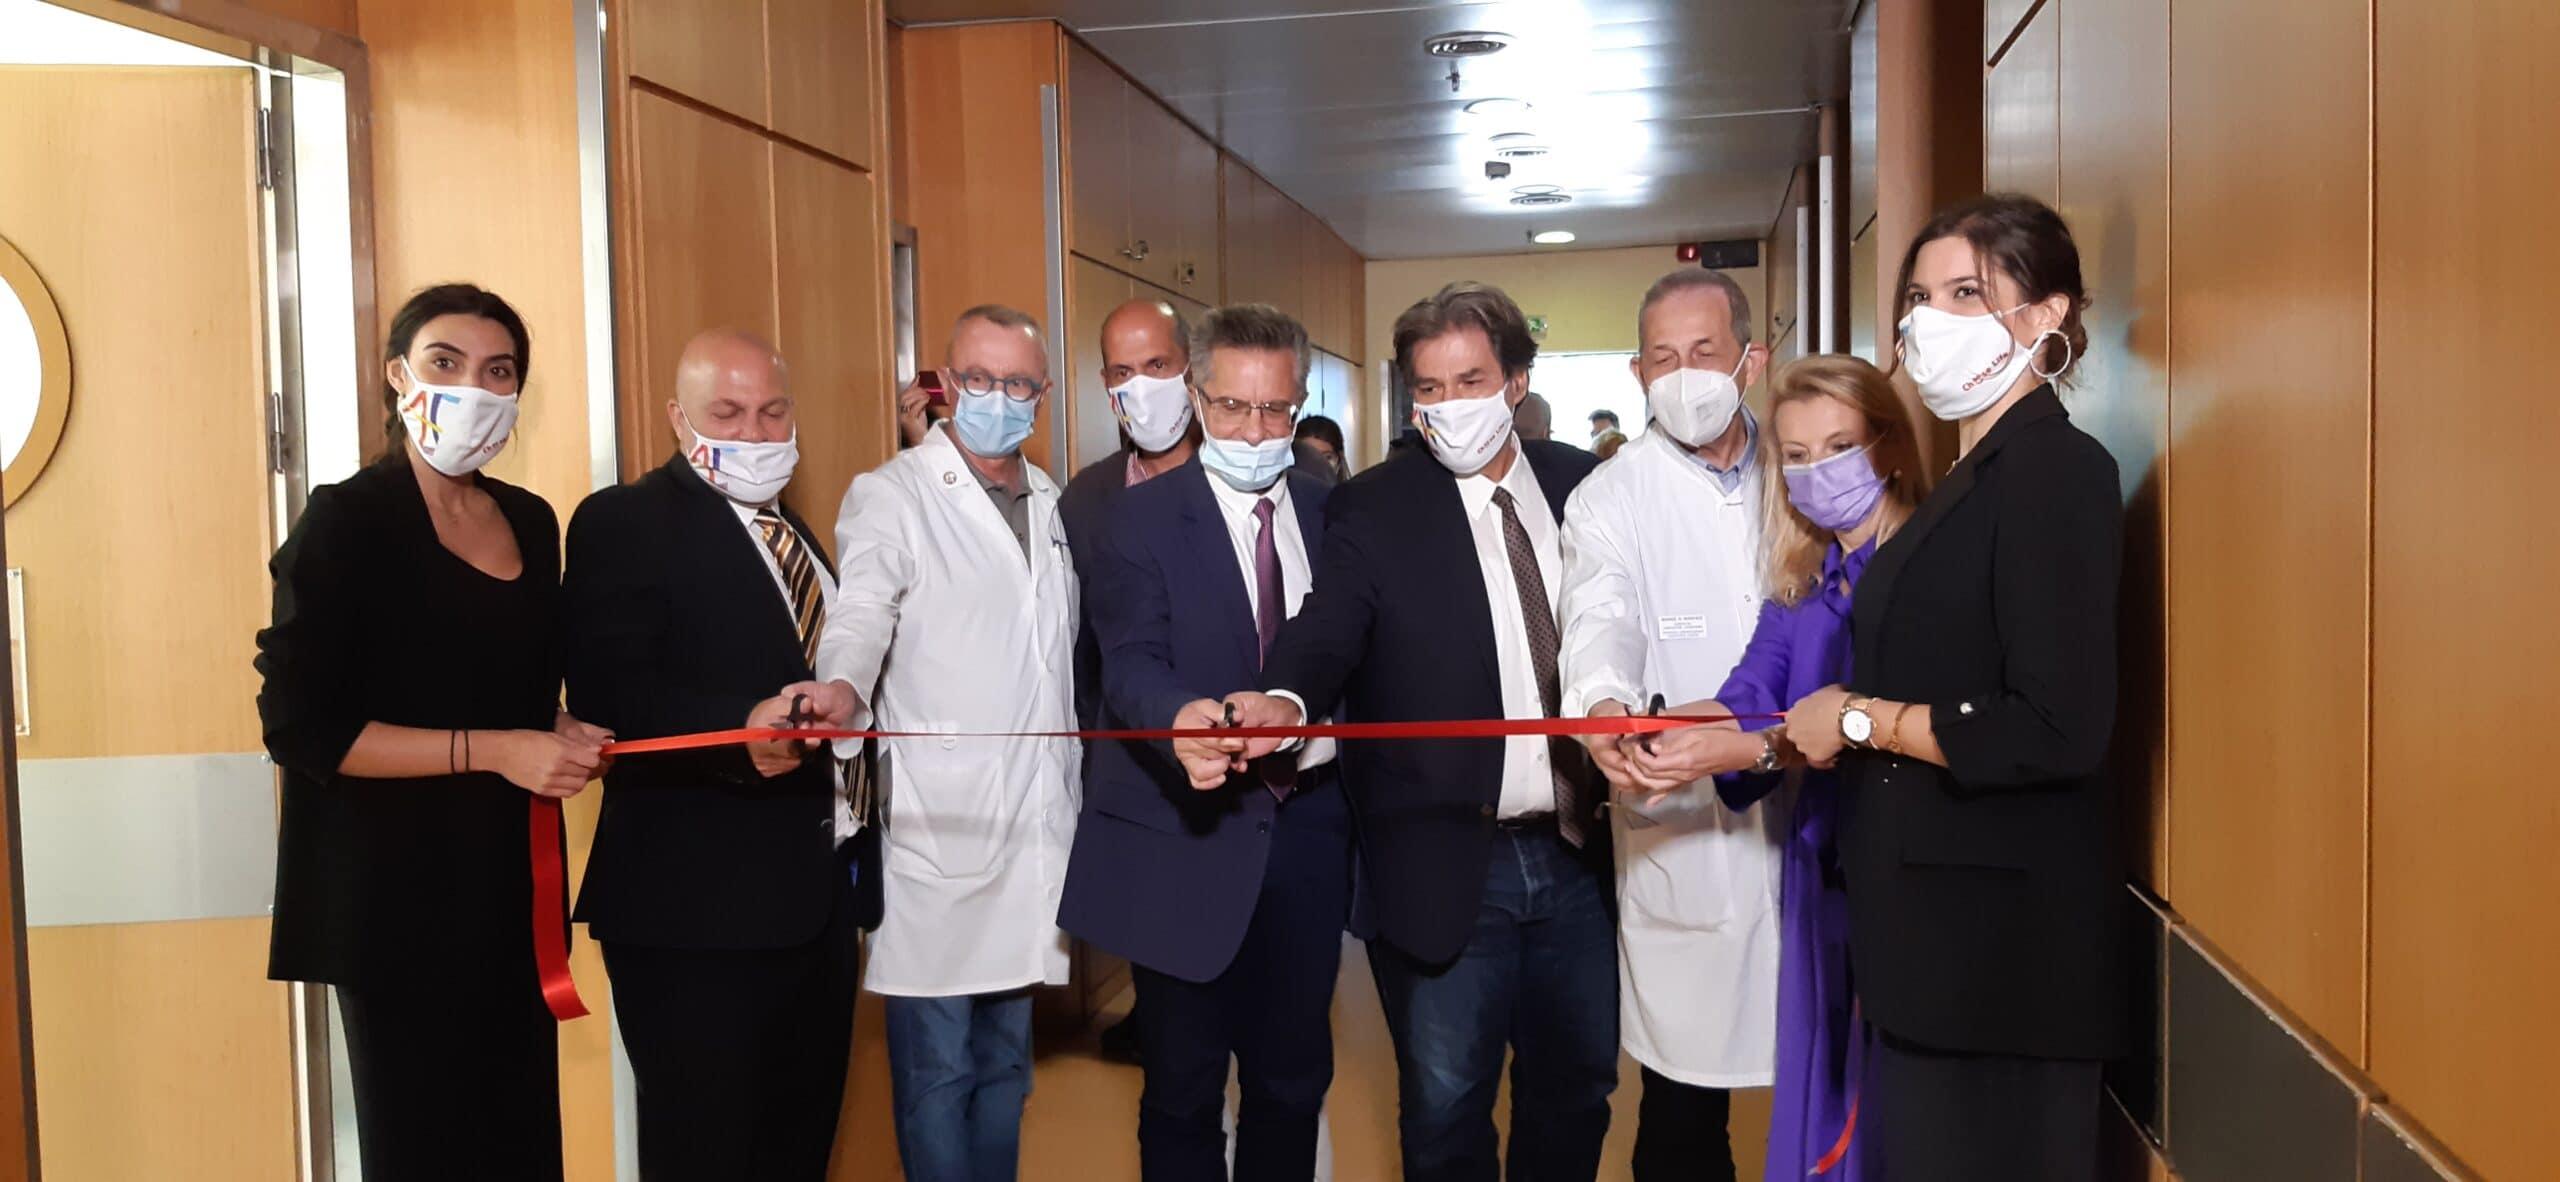 O Δημήτρης διάλεξε να σώσει τους άλλους - Στην Πάτρα ένα από τα καλύτερα Ινστιτούτα κυτταρικών θεραπειών της Ευρώπης!